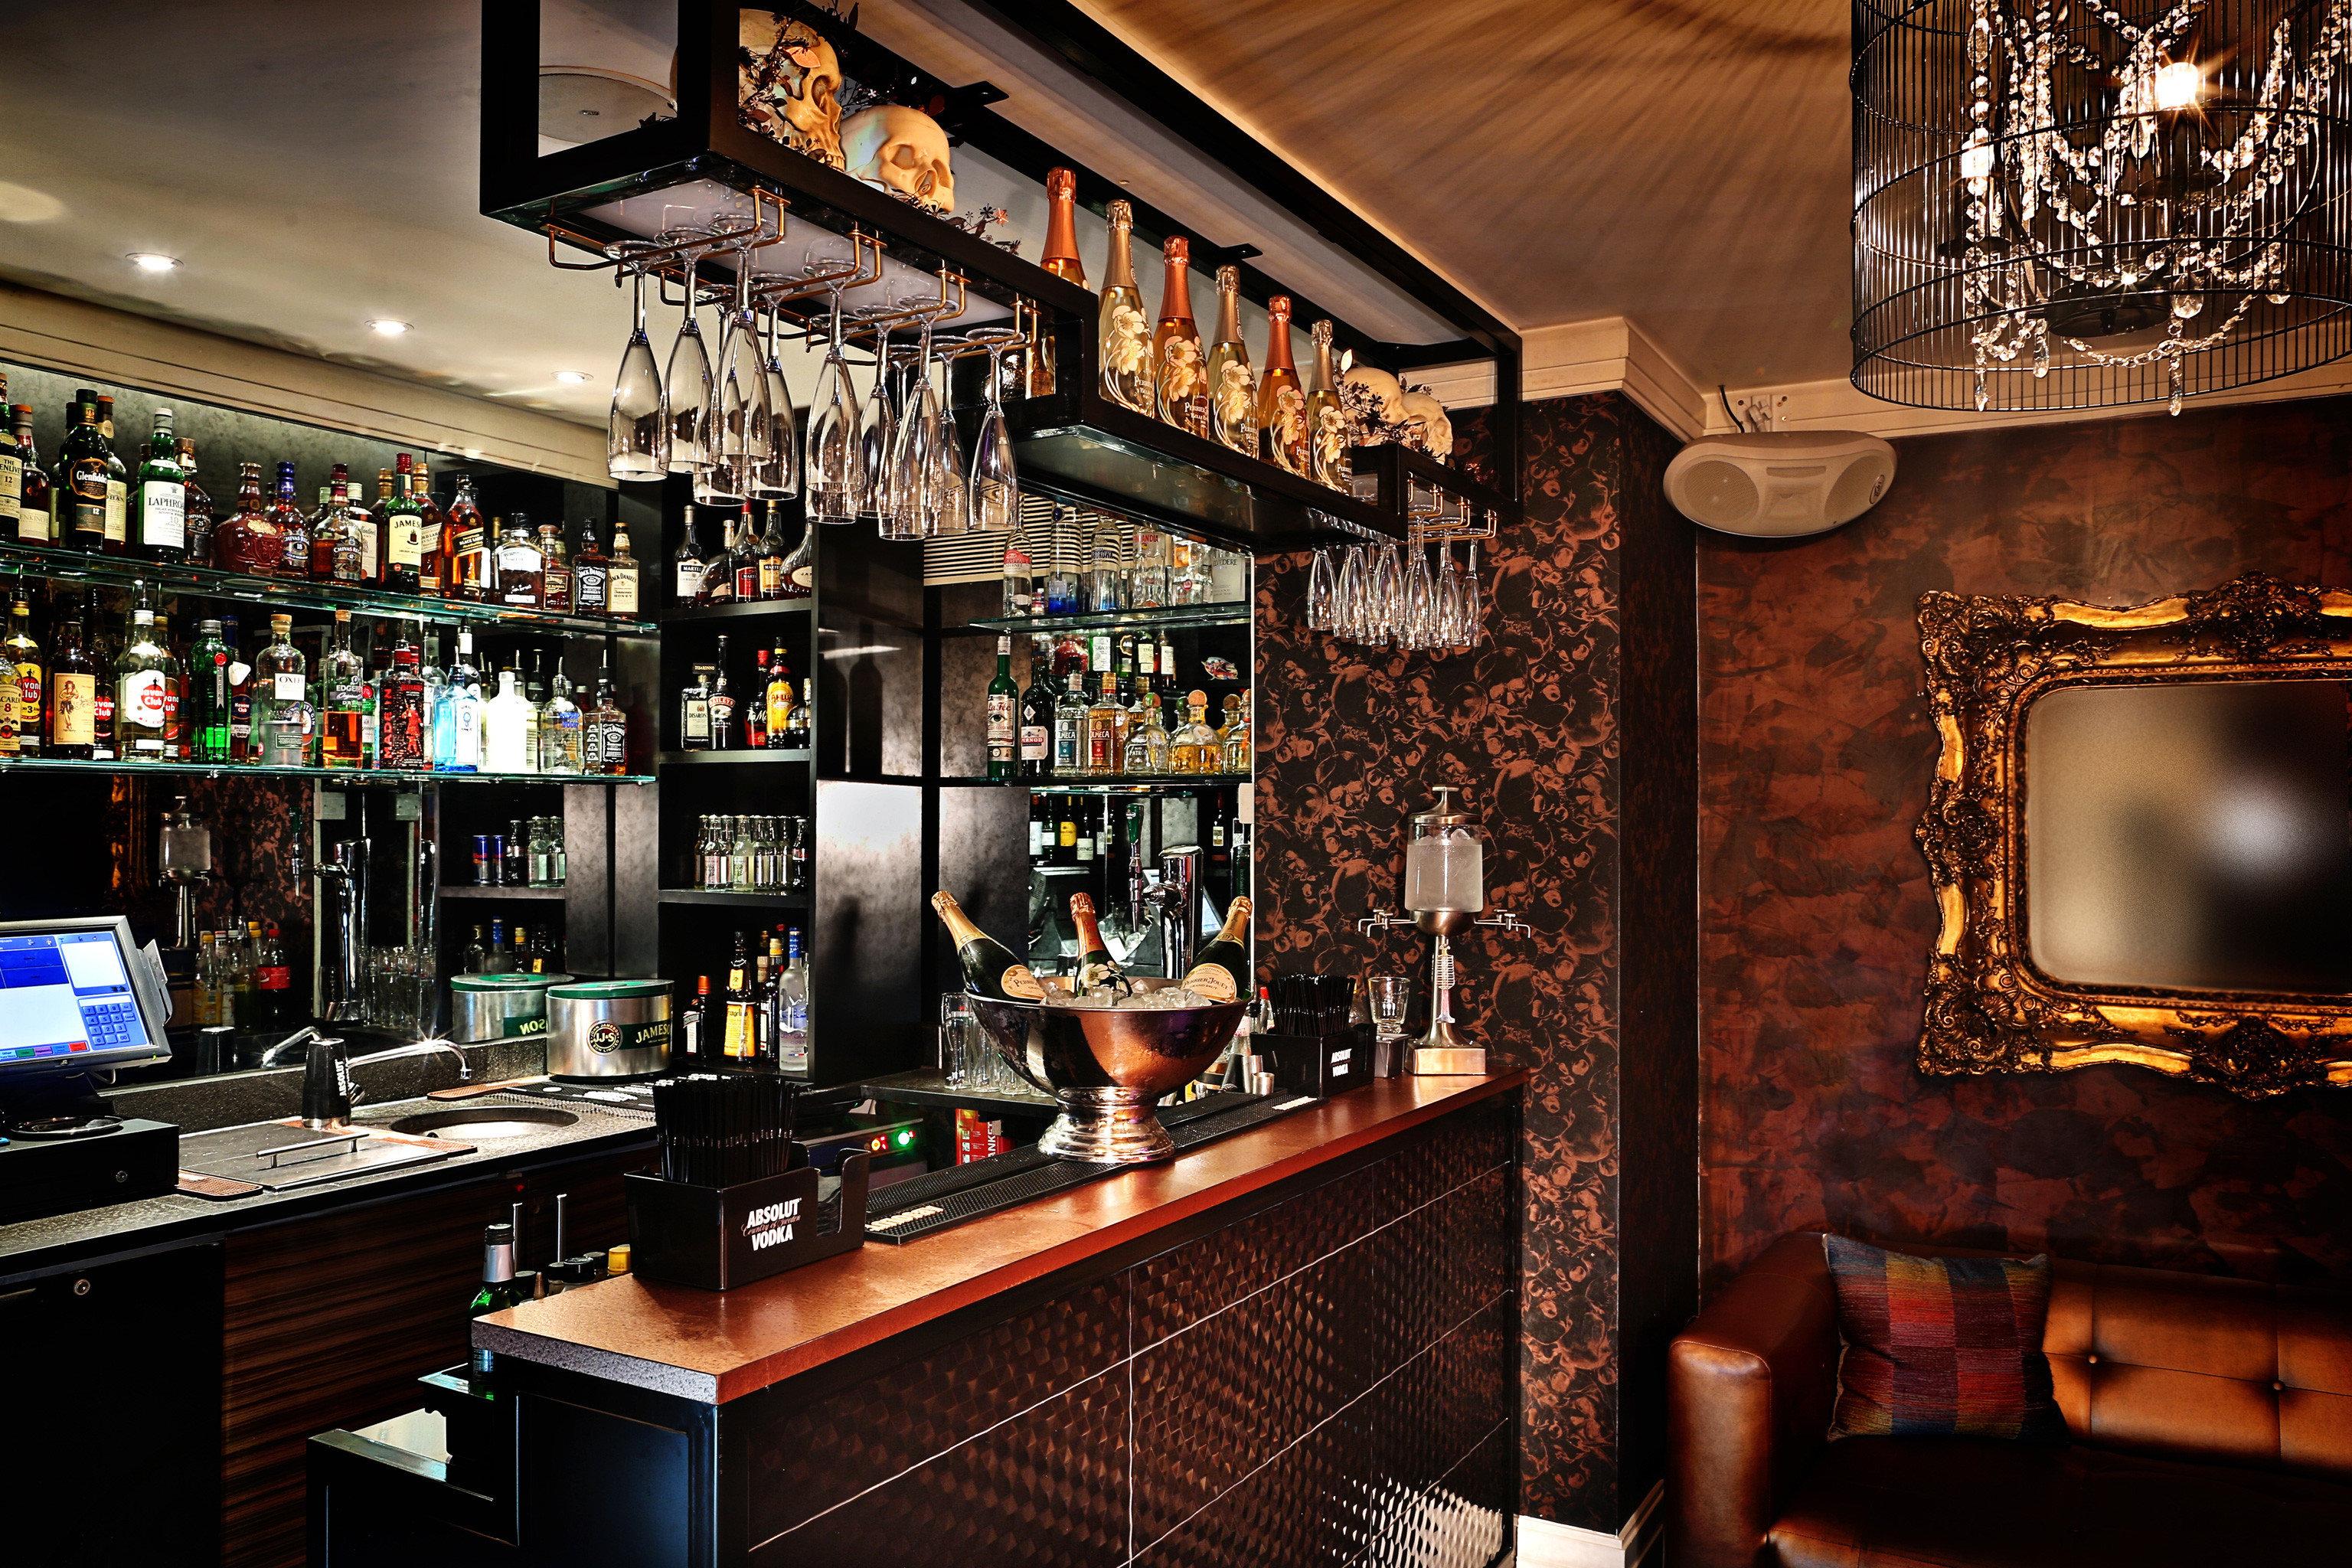 Bar Dining Drink Eat Hip Modern restaurant